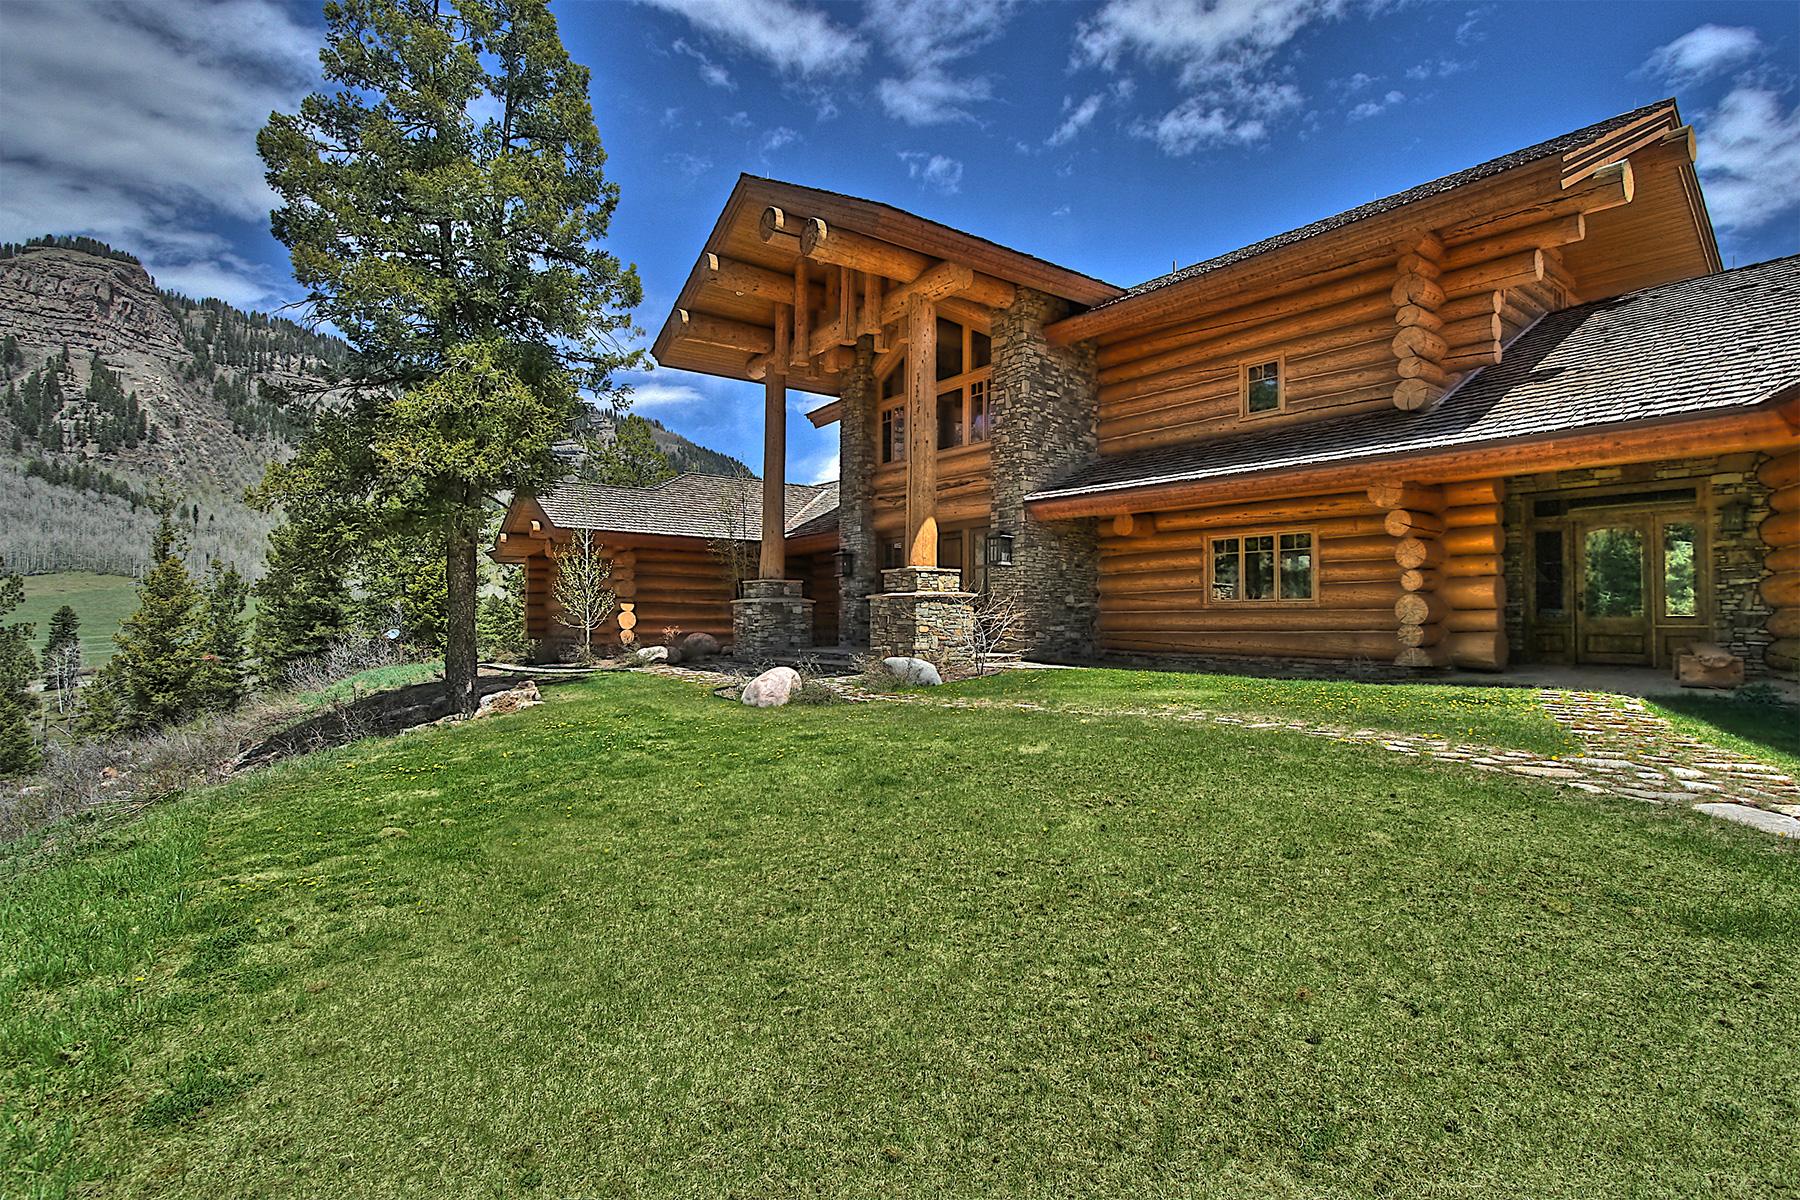 Casa Unifamiliar por un Venta en Mountain View Estate 463 & 464 Pinnacle View Drive Durango, Colorado 81301 Estados Unidos